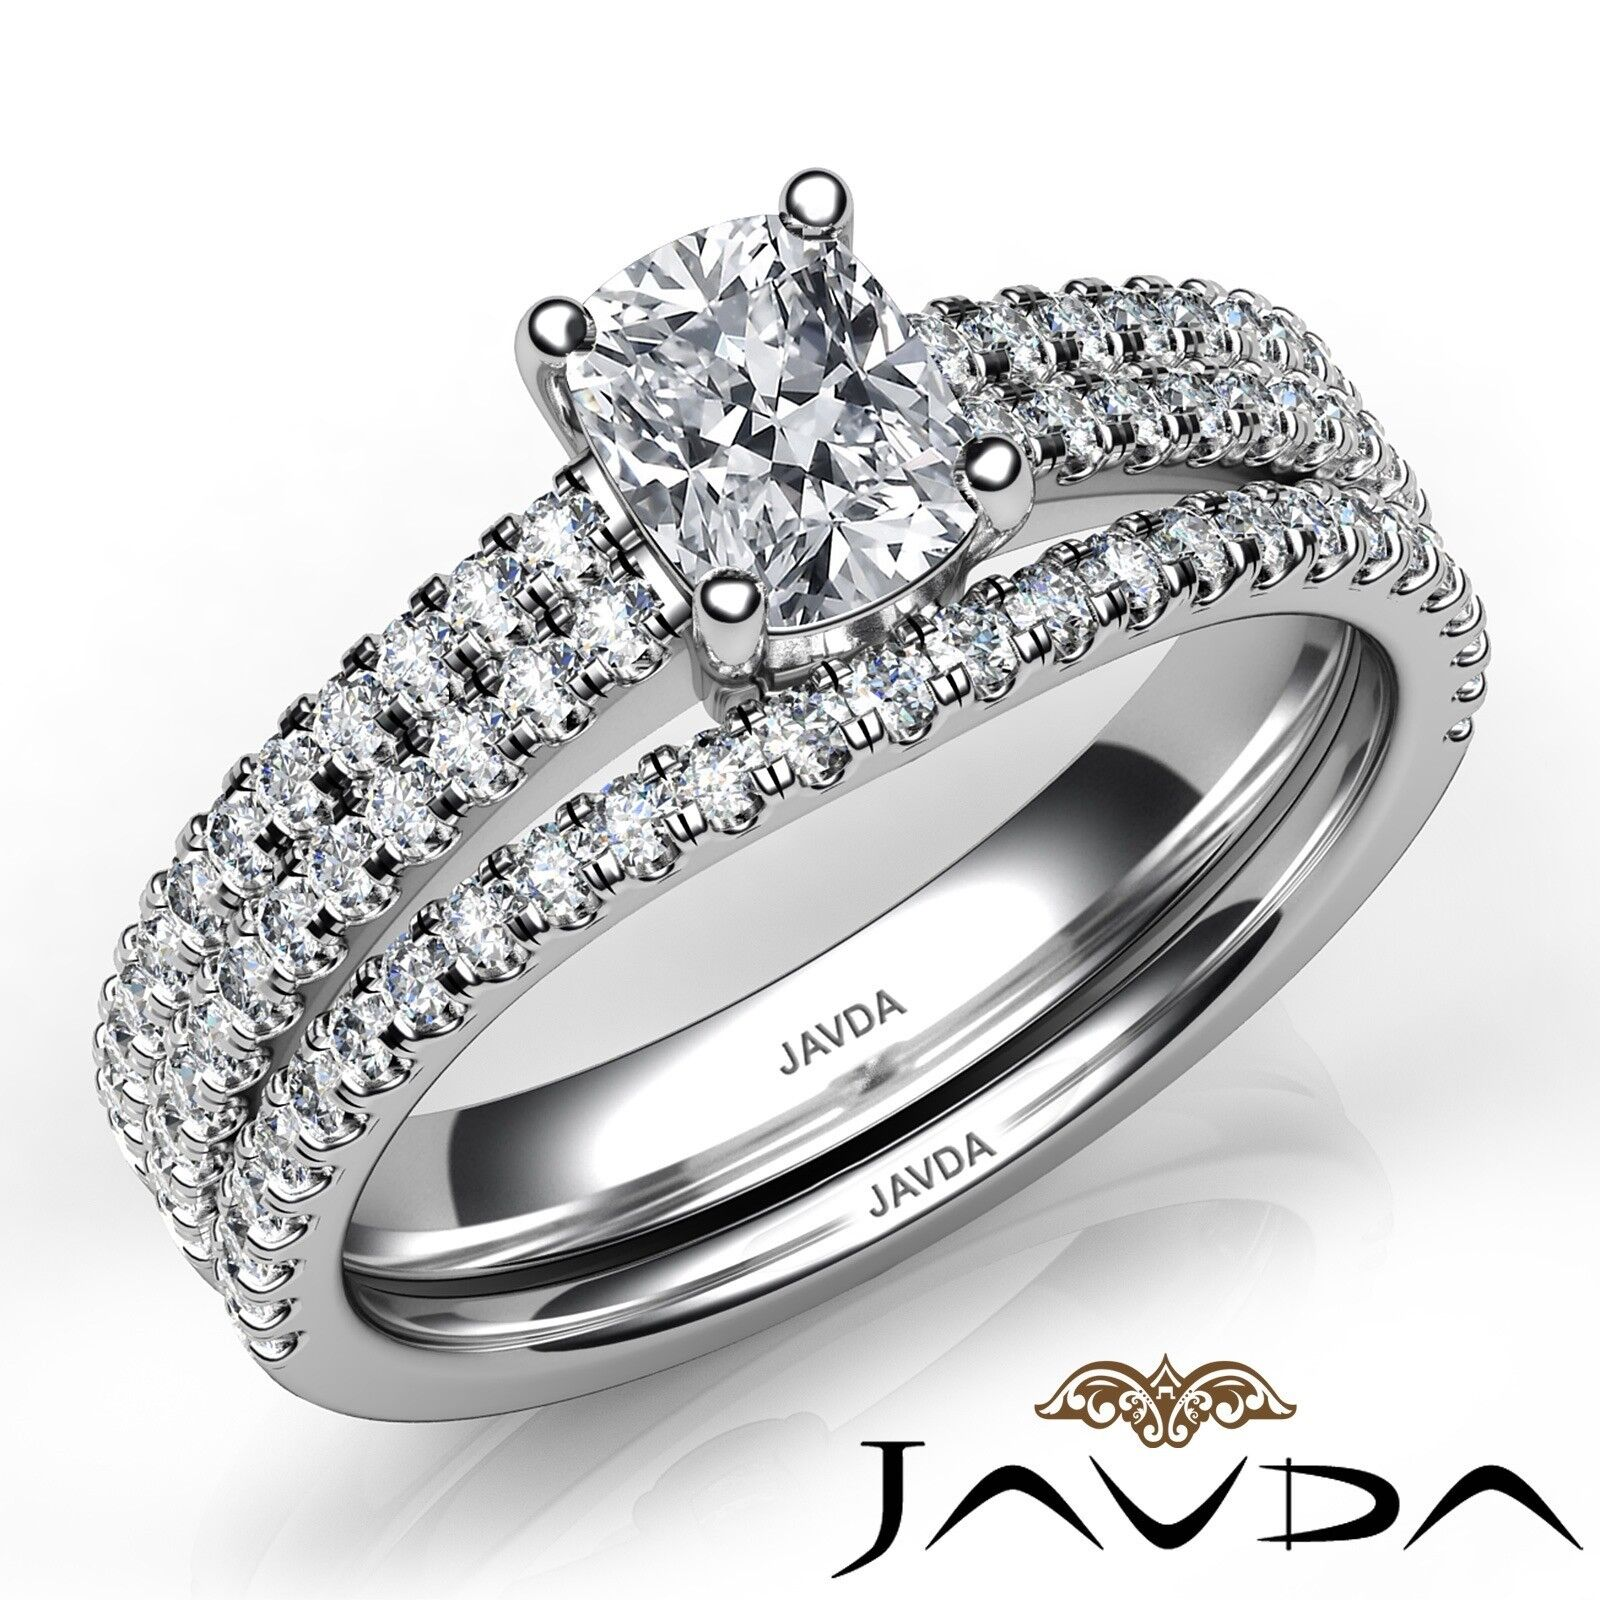 1.8ctw Bridal Scalloped Pave Cushion Diamond Engagement Ring GIA F-VVS2 W Gold 1